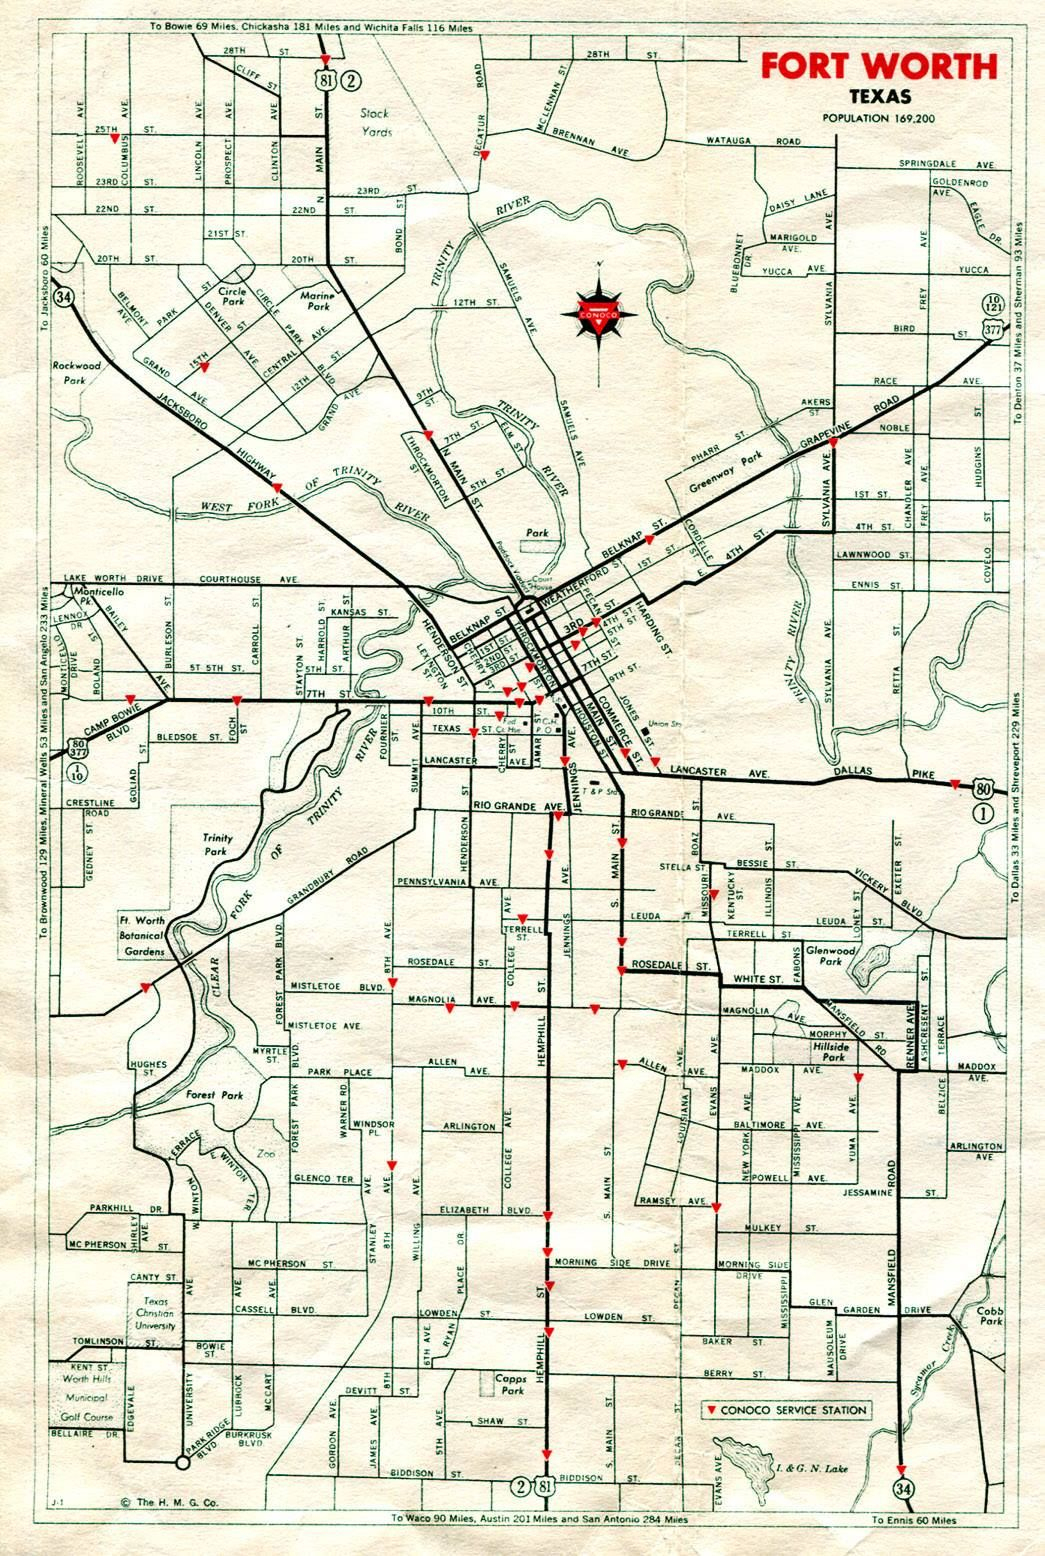 Pinattia Roman On Texas <3 | Texas History, Lone Star State, Old - Street Map Of Fort Worth Texas